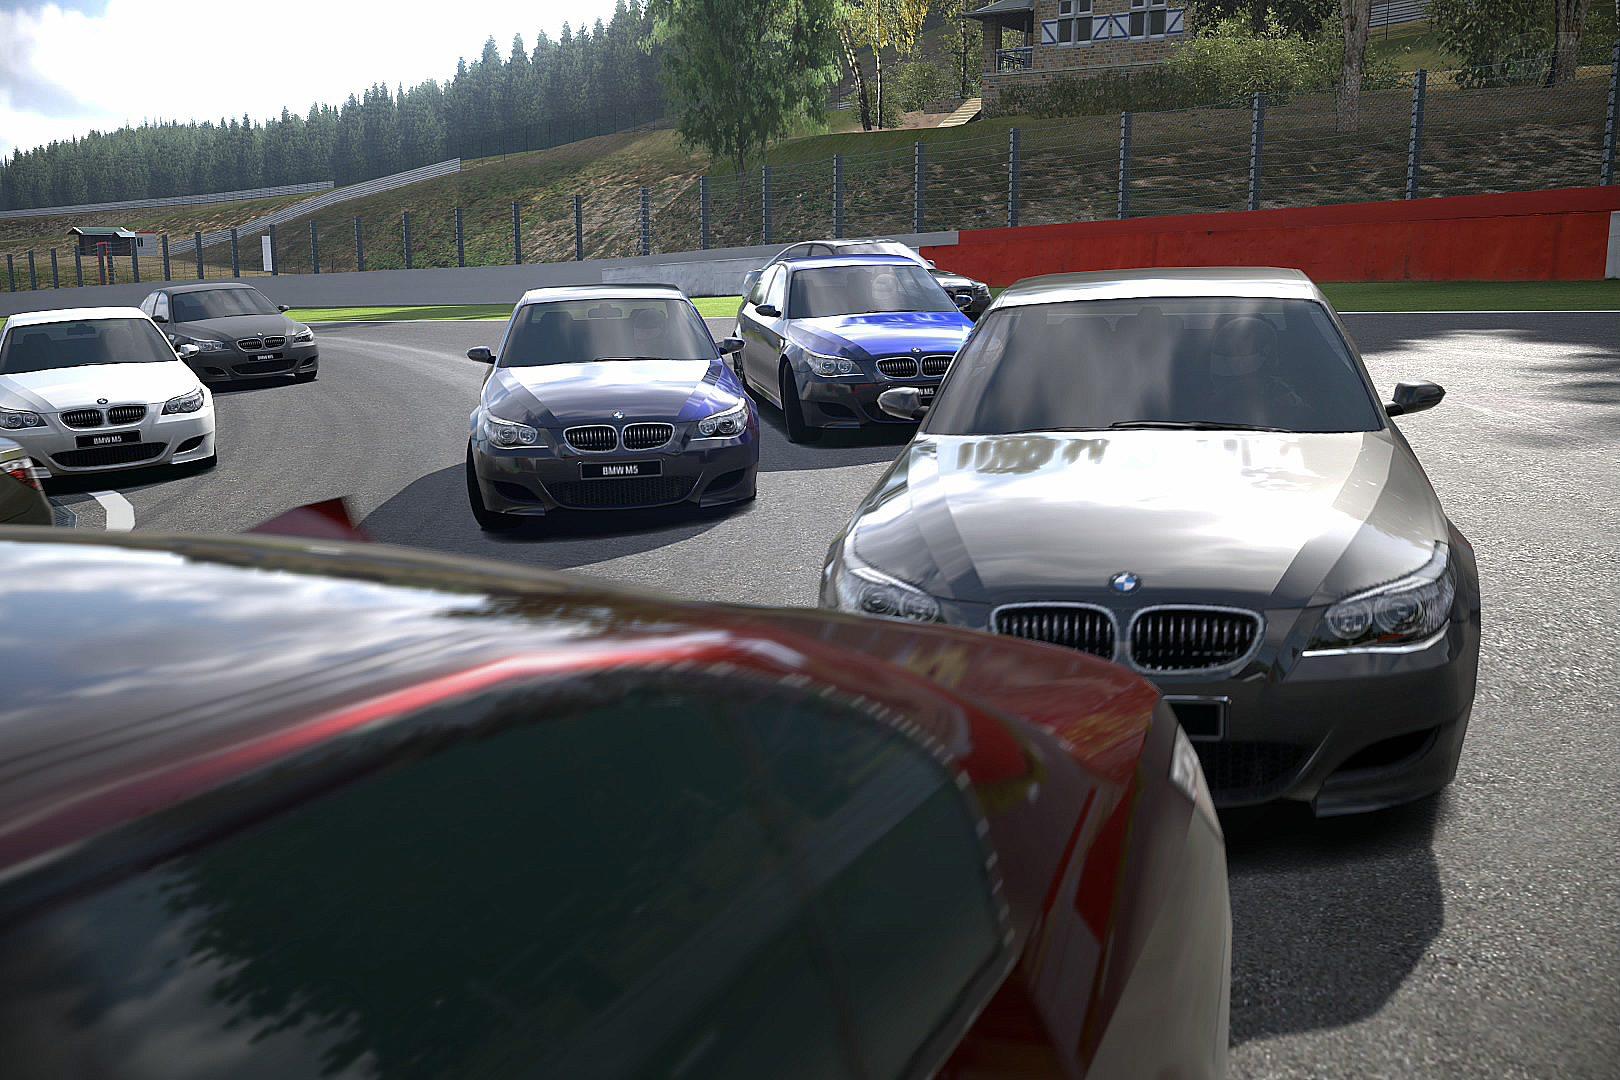 Circuit de Spa-Francorchamps_14.jpg